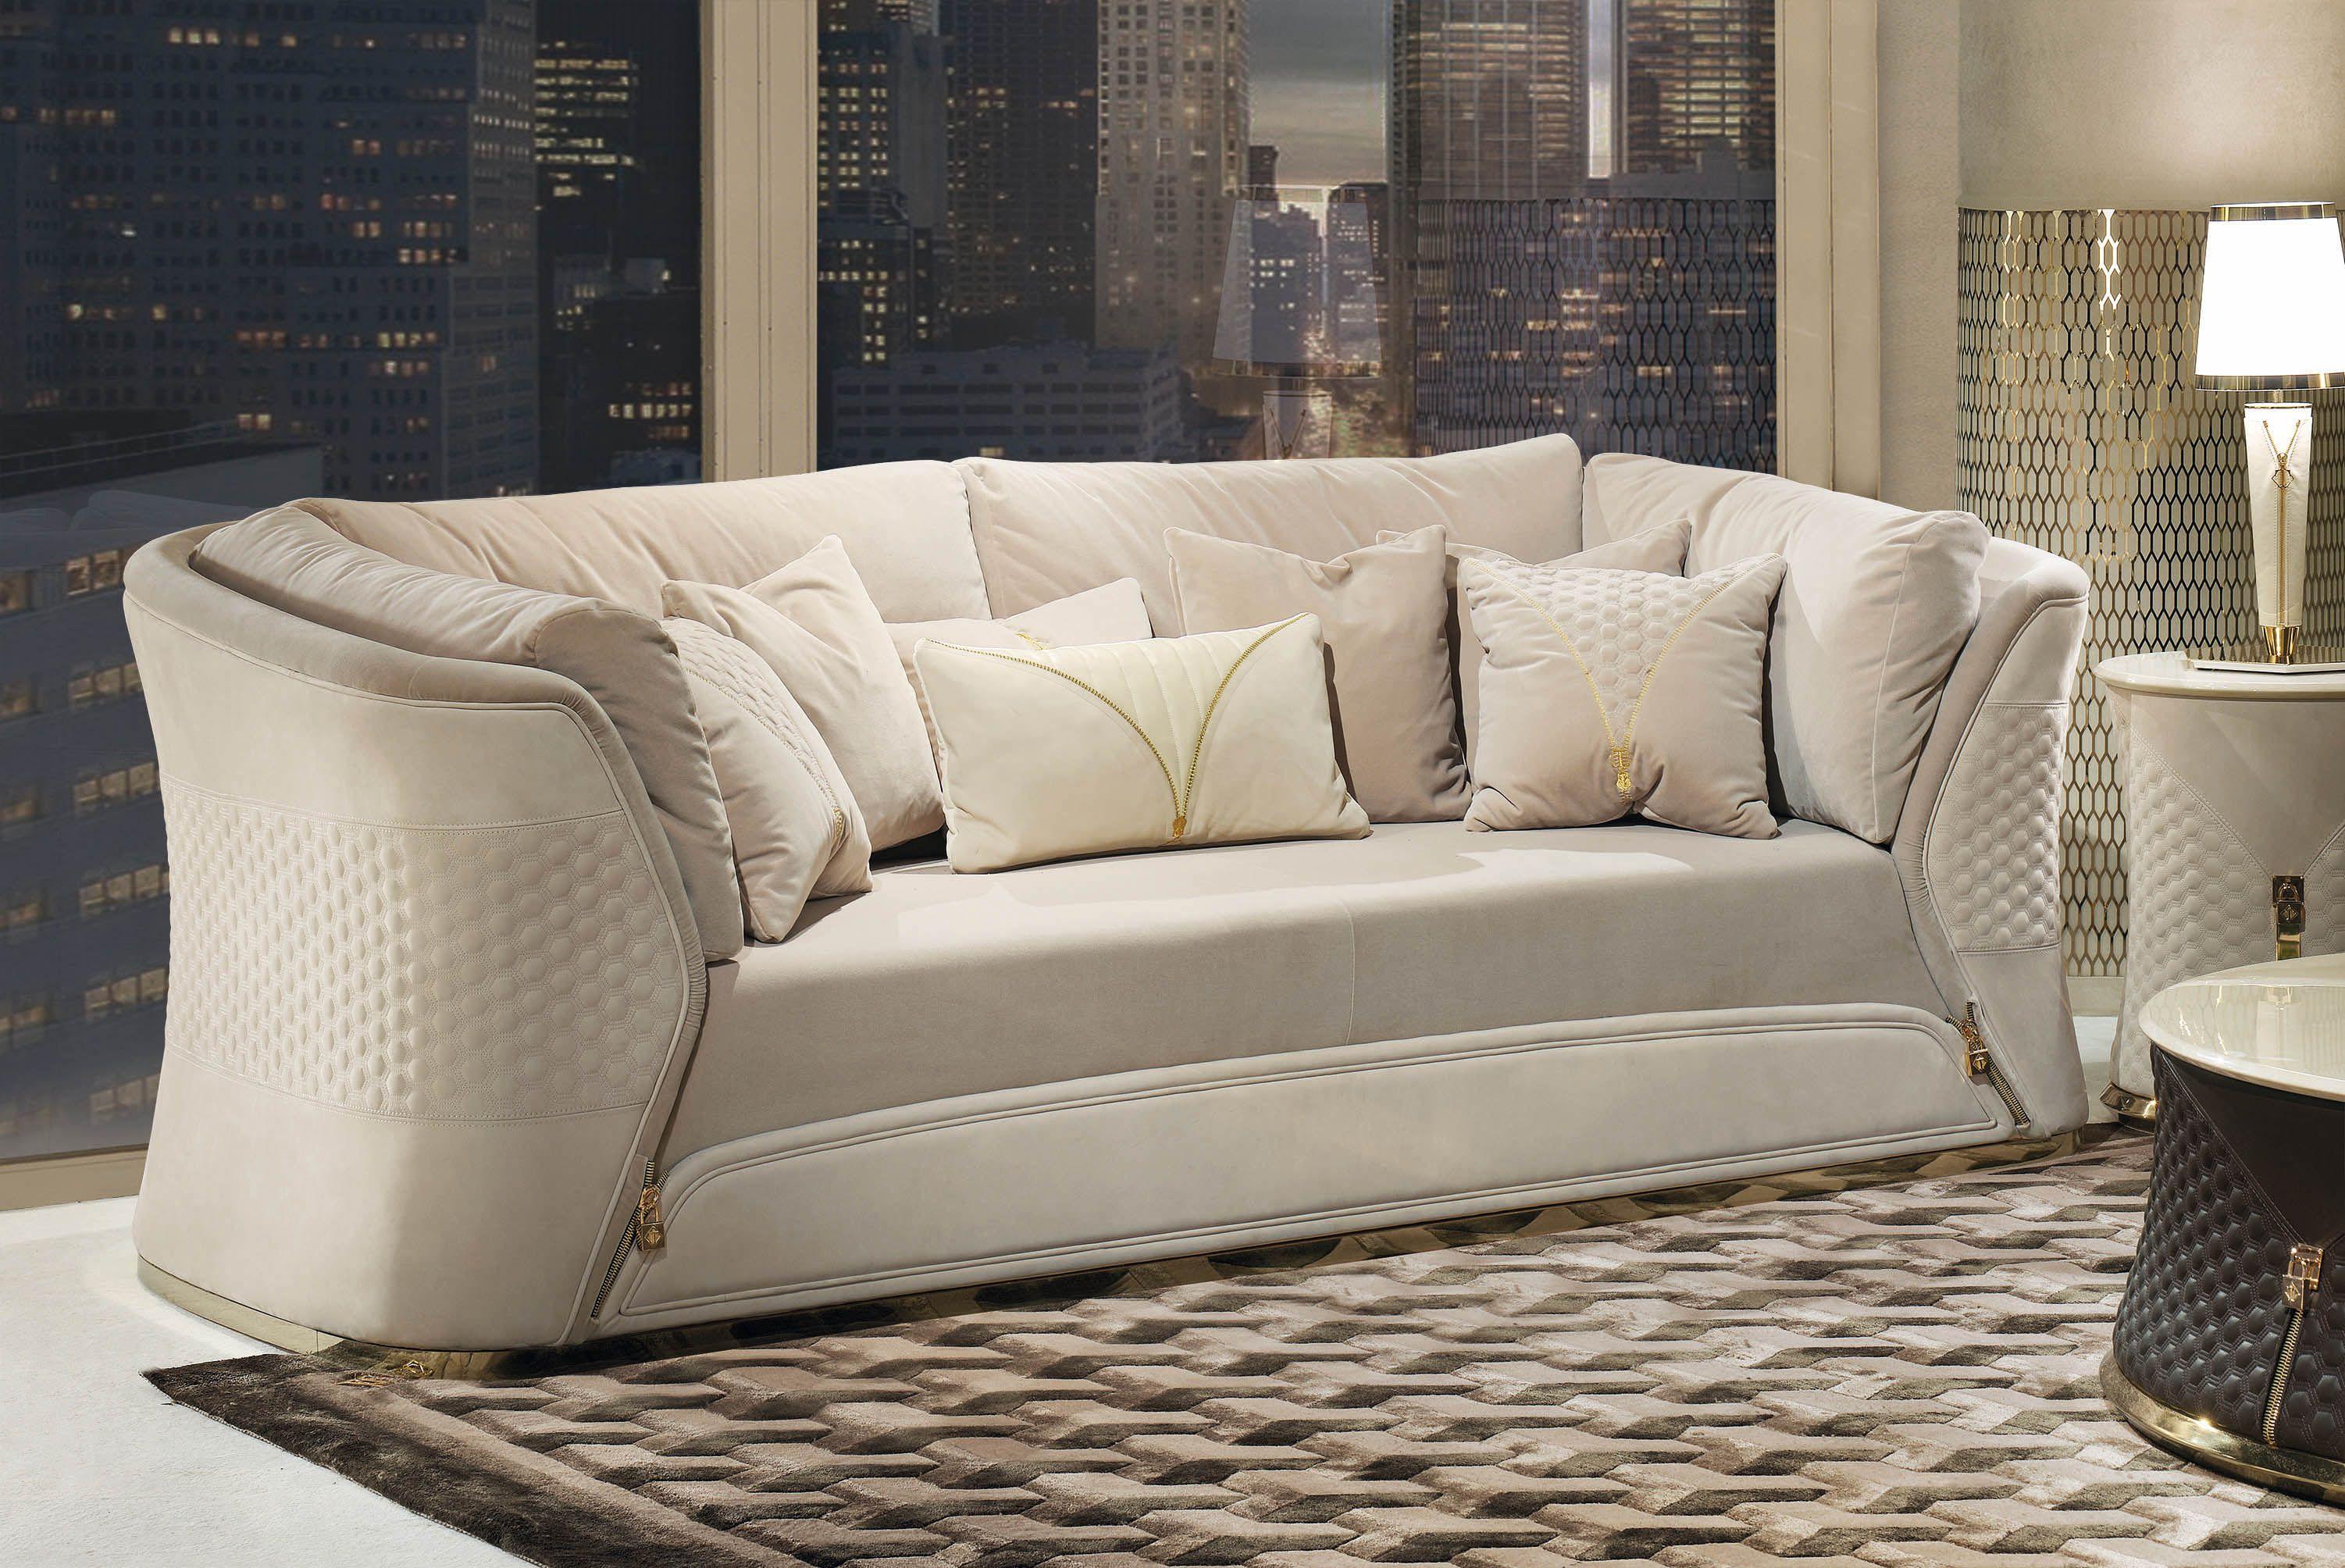 Italian Furniture Pinterest Vogue Bedroom Turri It Italian Luxury